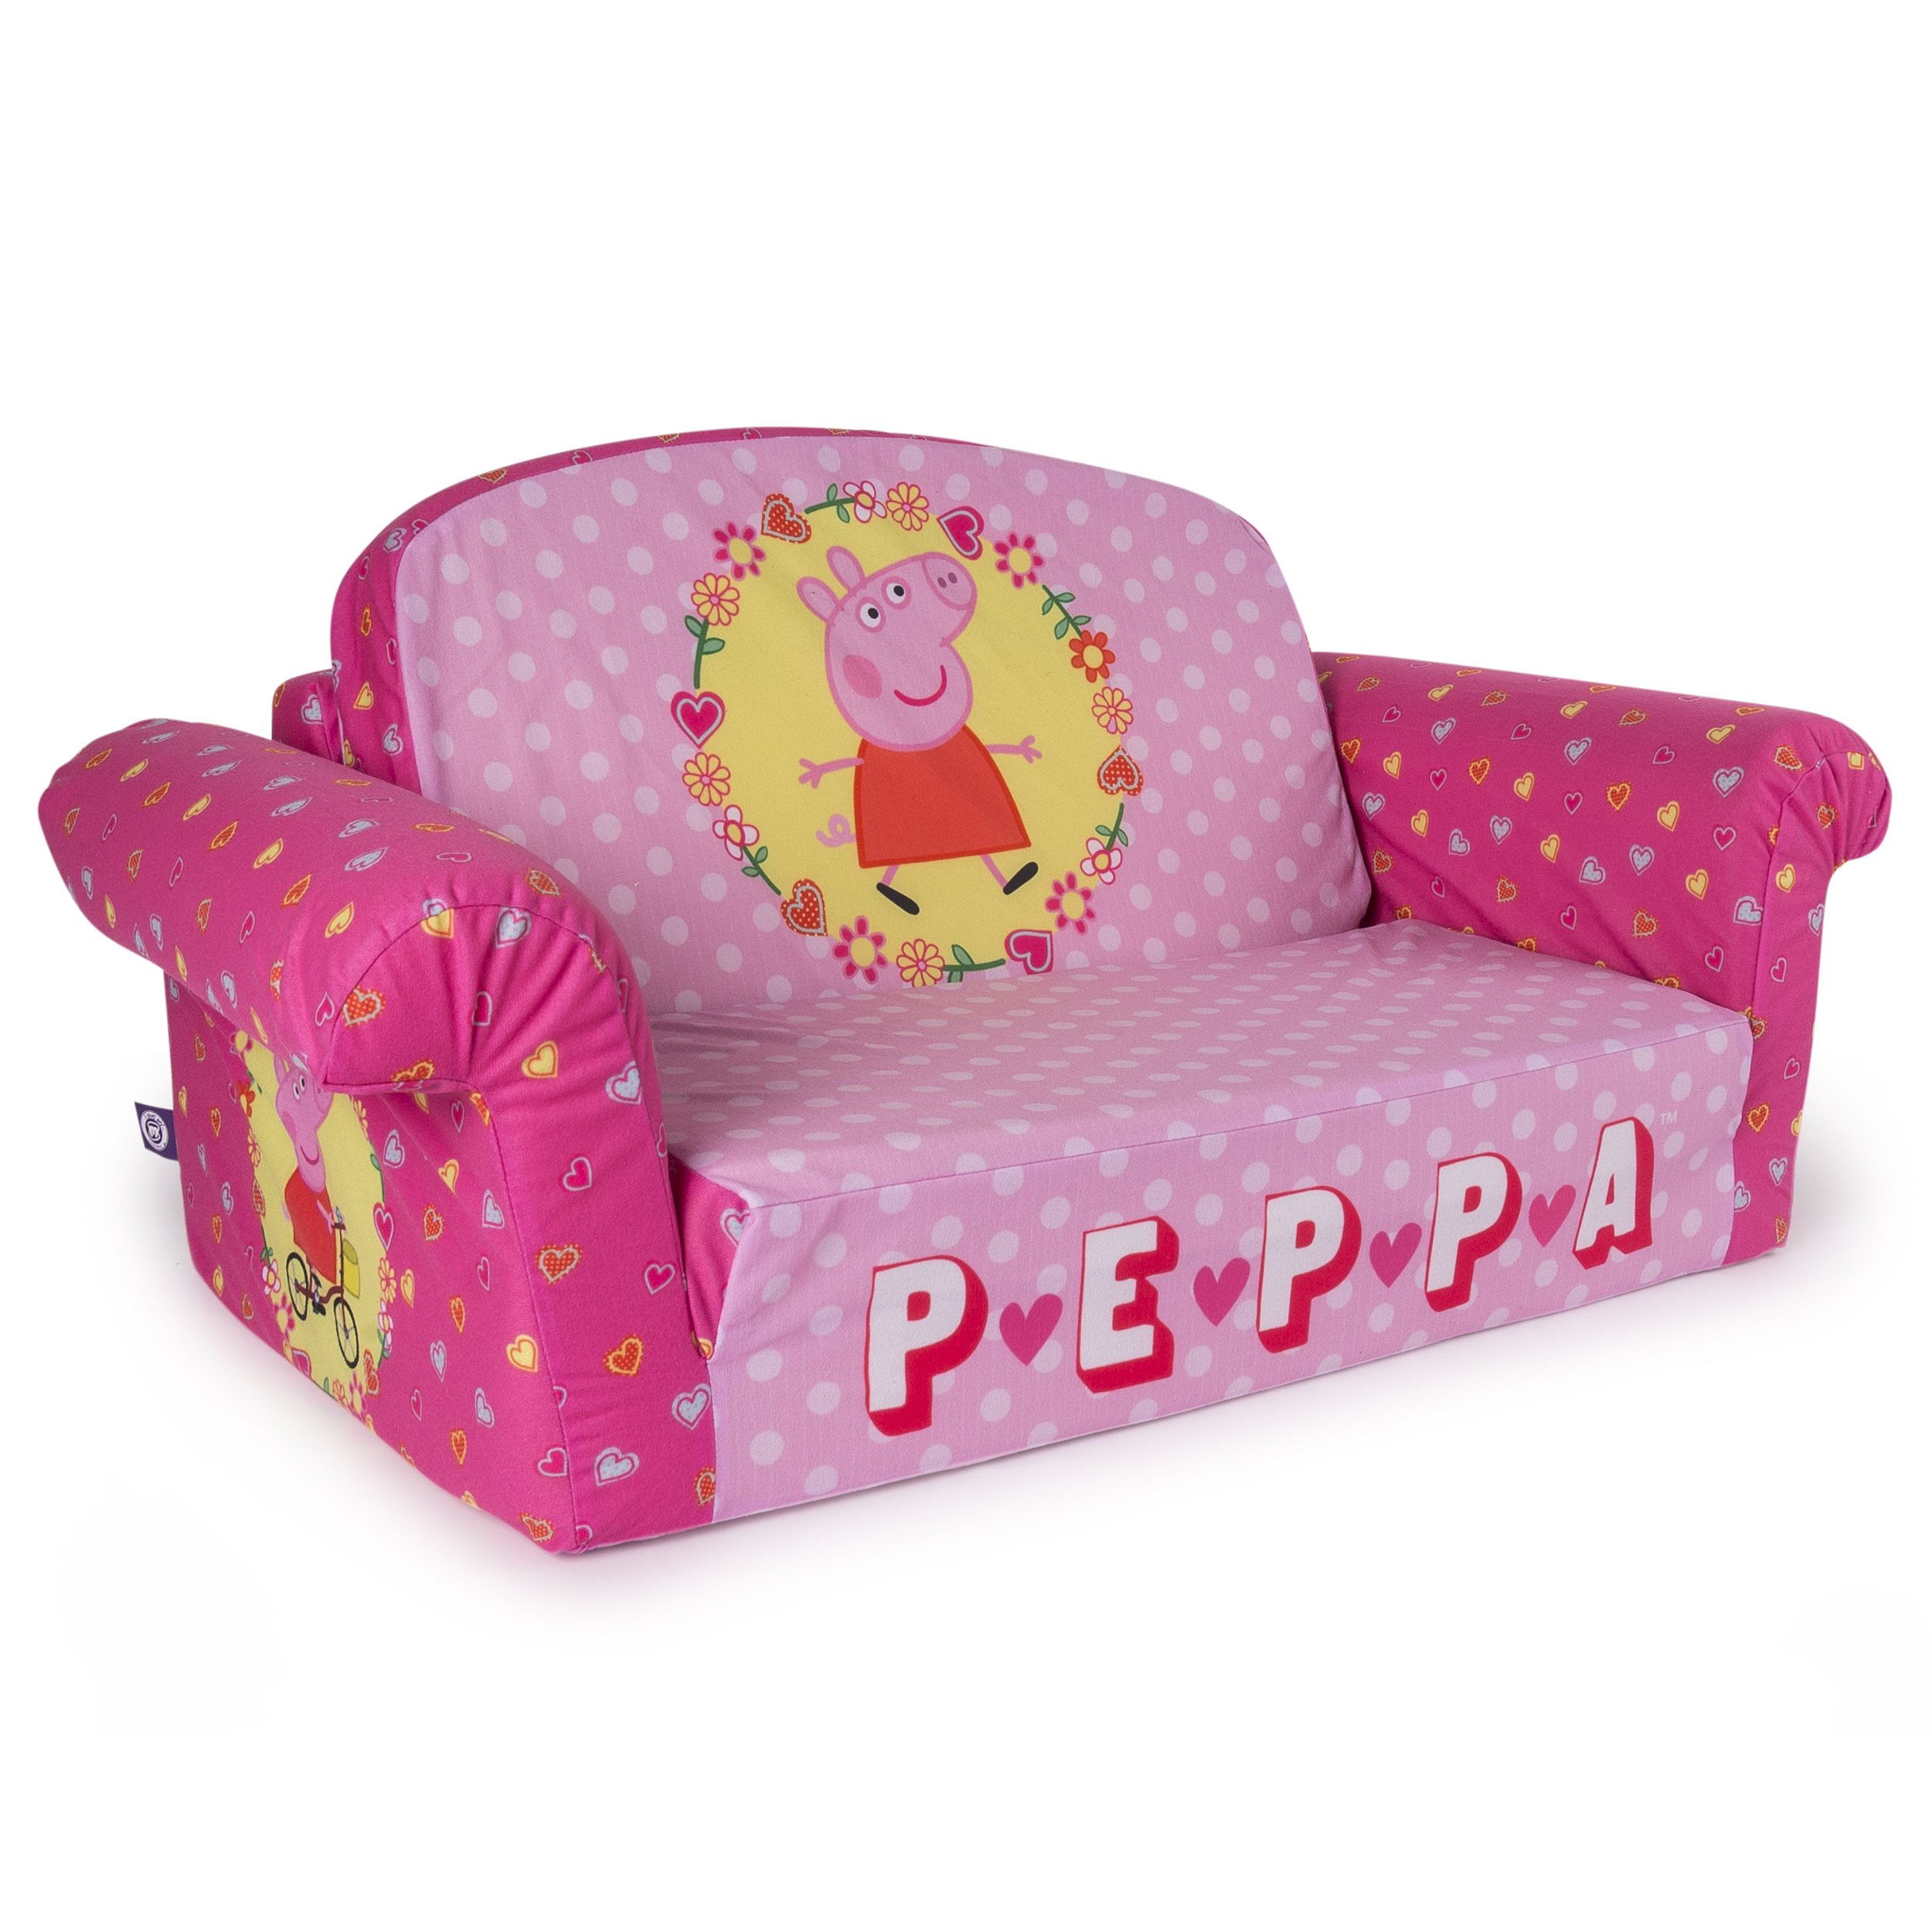 Marshmallow Furniture Childrens 2 In 1 Flip Open Foam Sofa Peppa